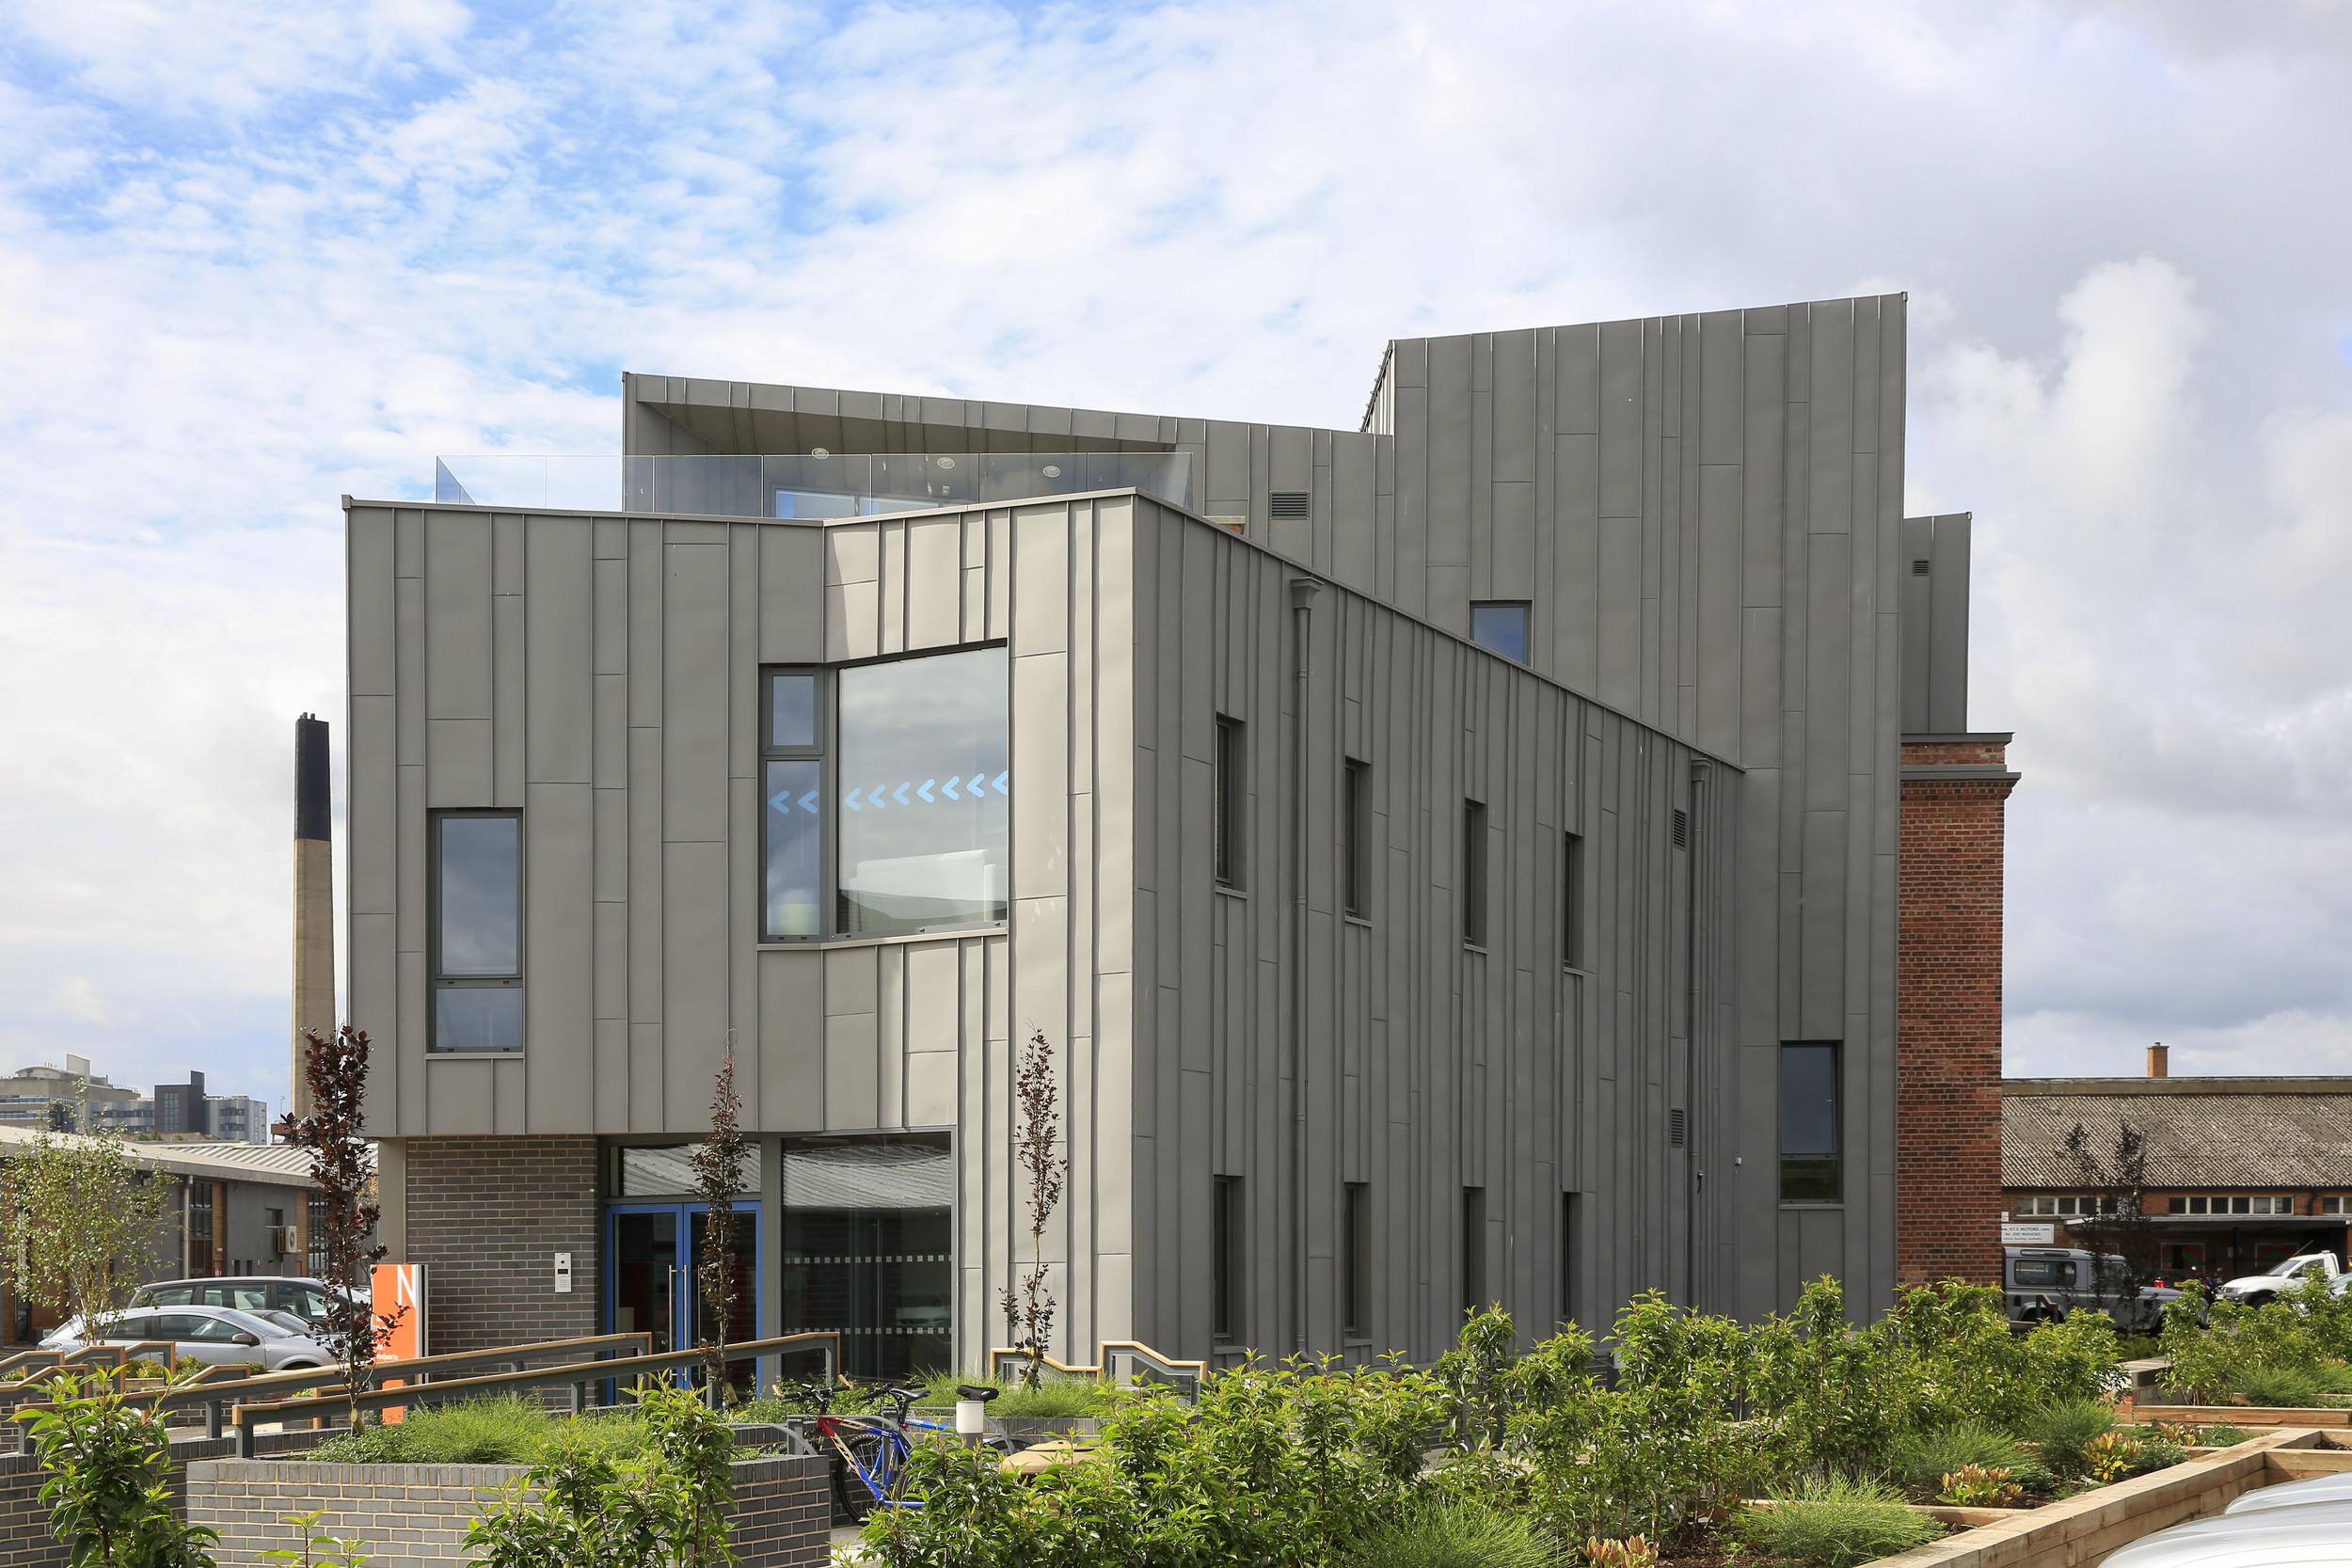 Creative Industries Belfast_23B7862 (18).jpg